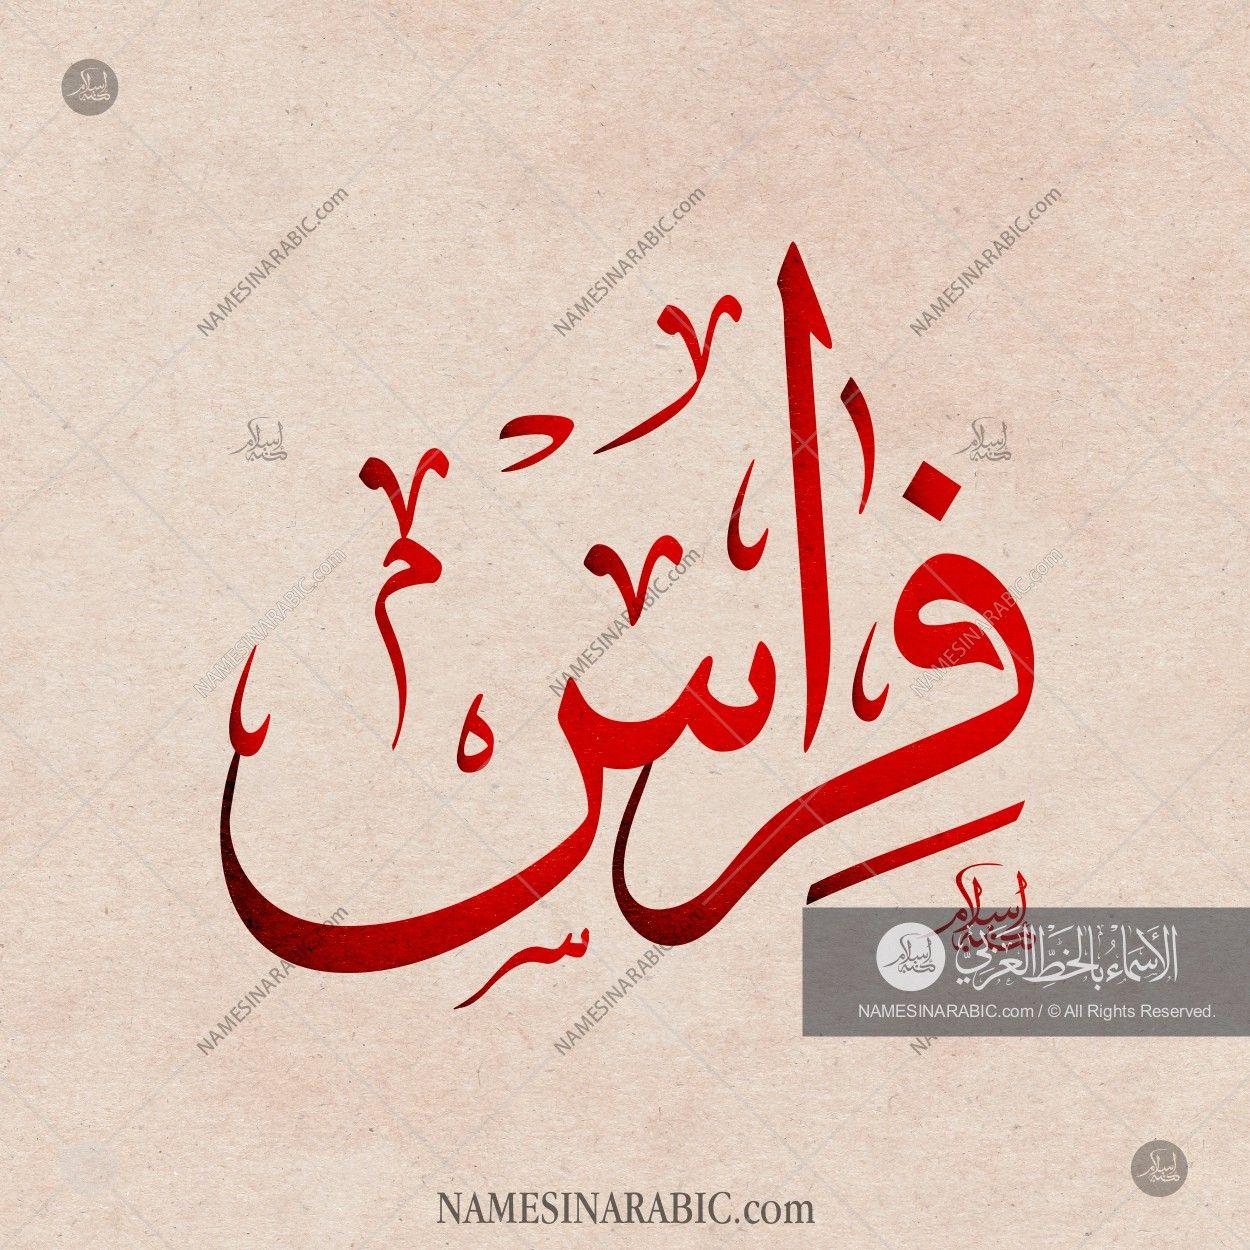 Firas فراس Names In Arabic Calligraphy Name 2947 Calligraphy Name Calligraphy Arabic Calligraphy Design